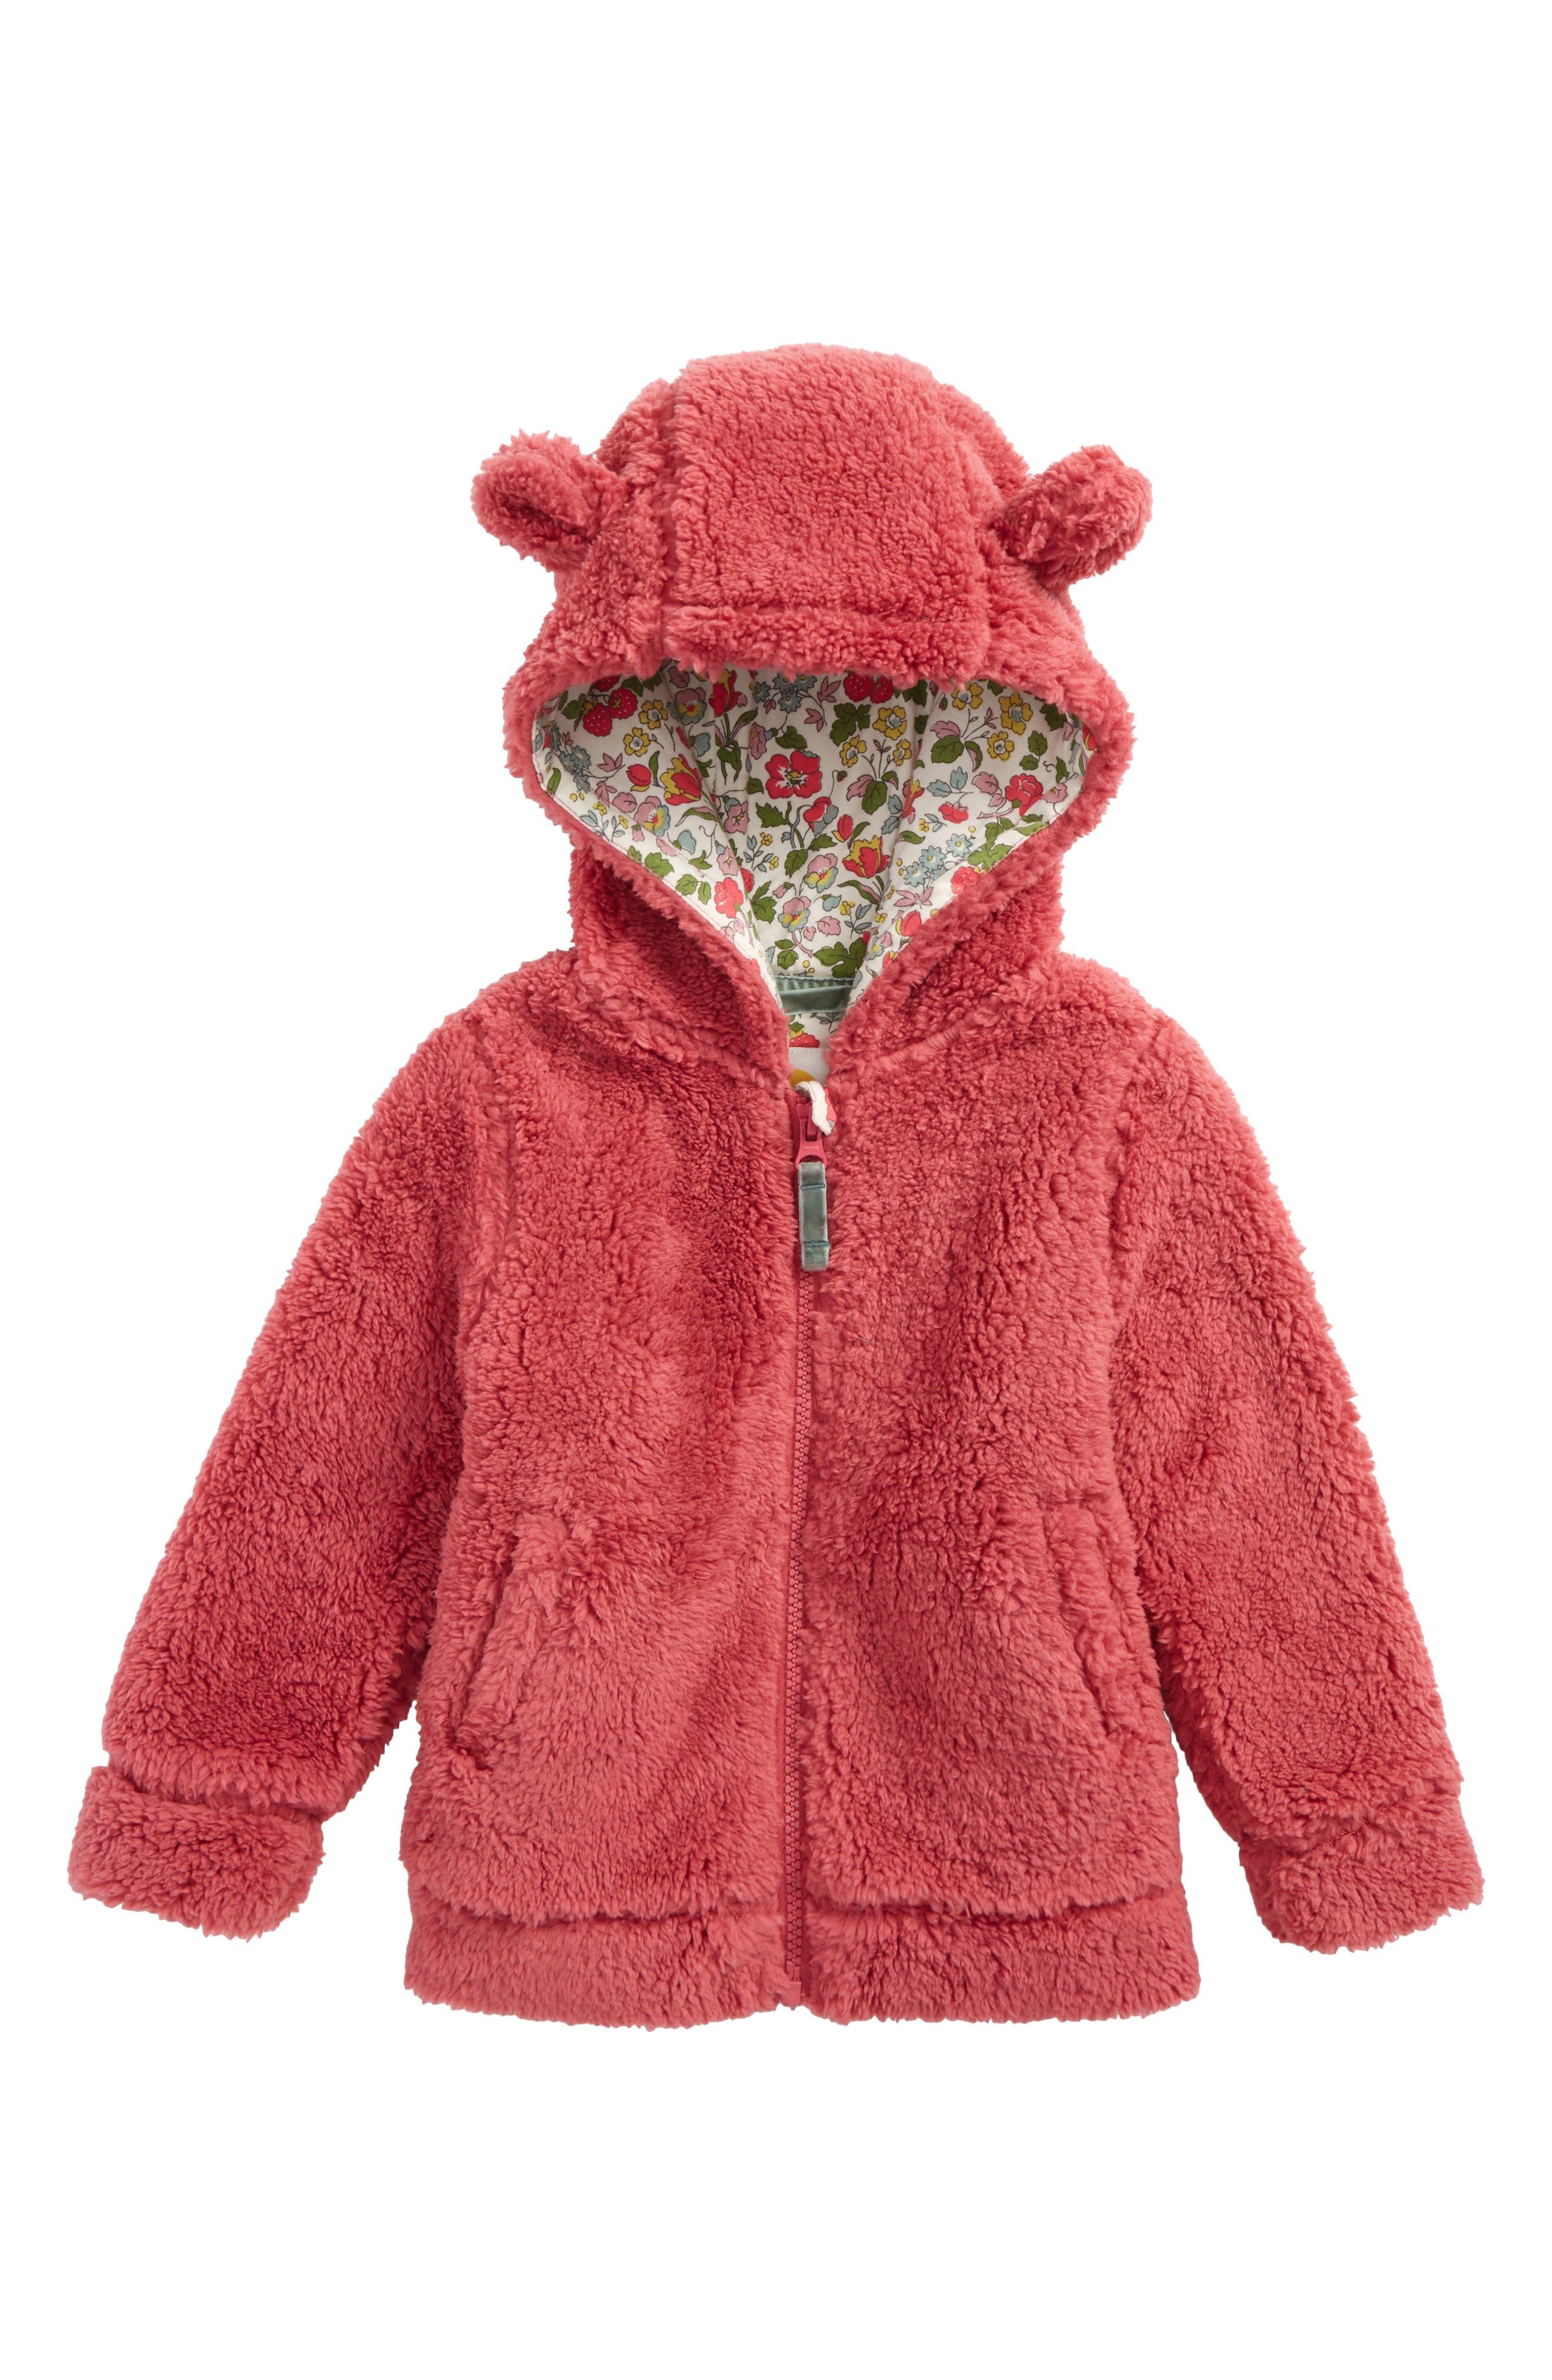 Main Image - Mini Boden Cosy Teddy Bear Hoodie (Toddler Girls, Little Girls & Big Girls)